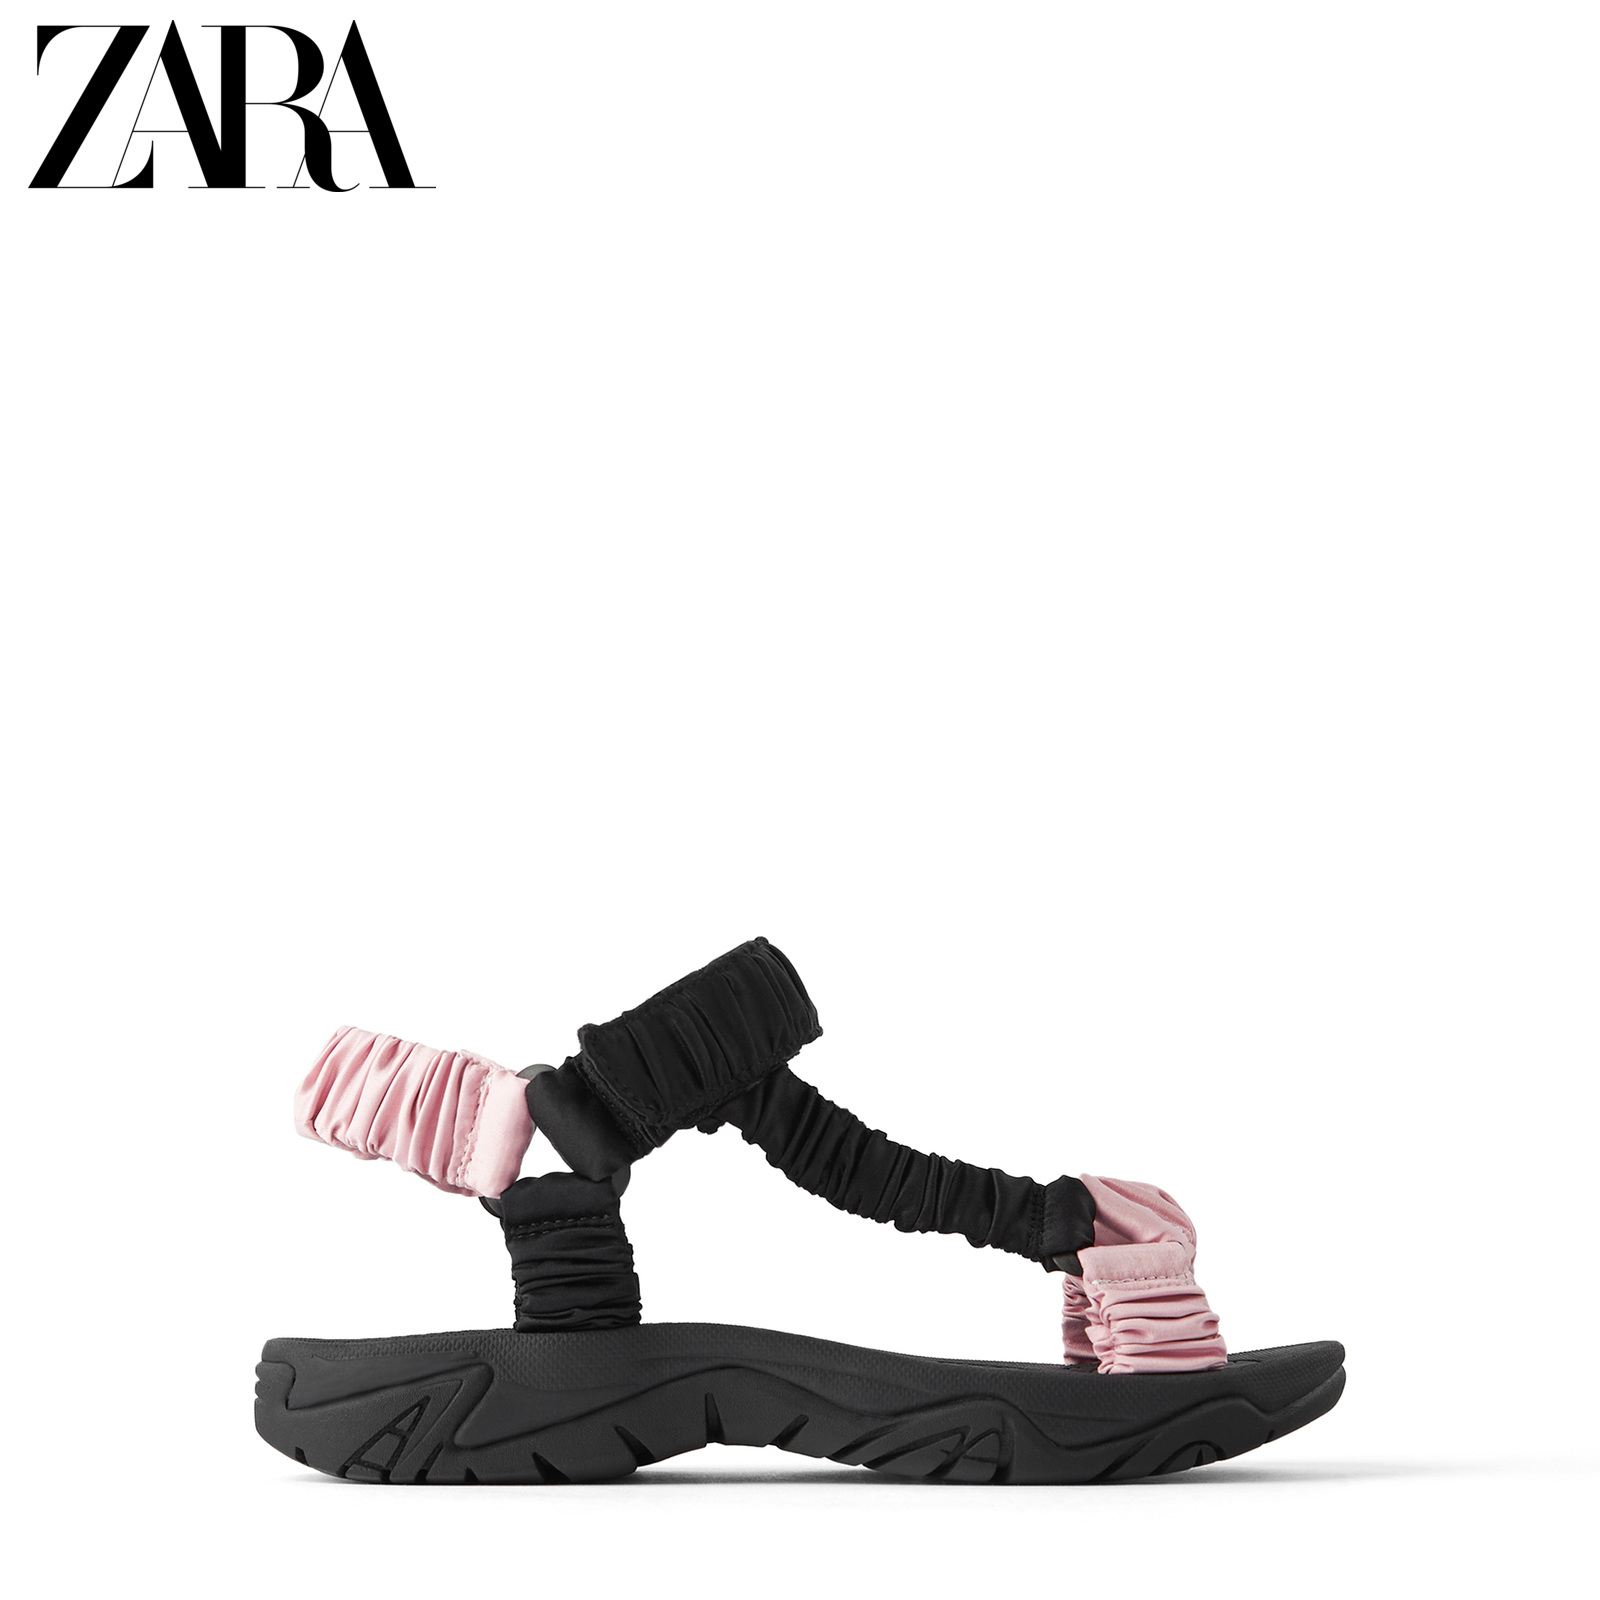 ZARATRF 女鞋 拼接蝴蝶结饰缎面运动平底凉鞋13878510202,降价幅度60.2%